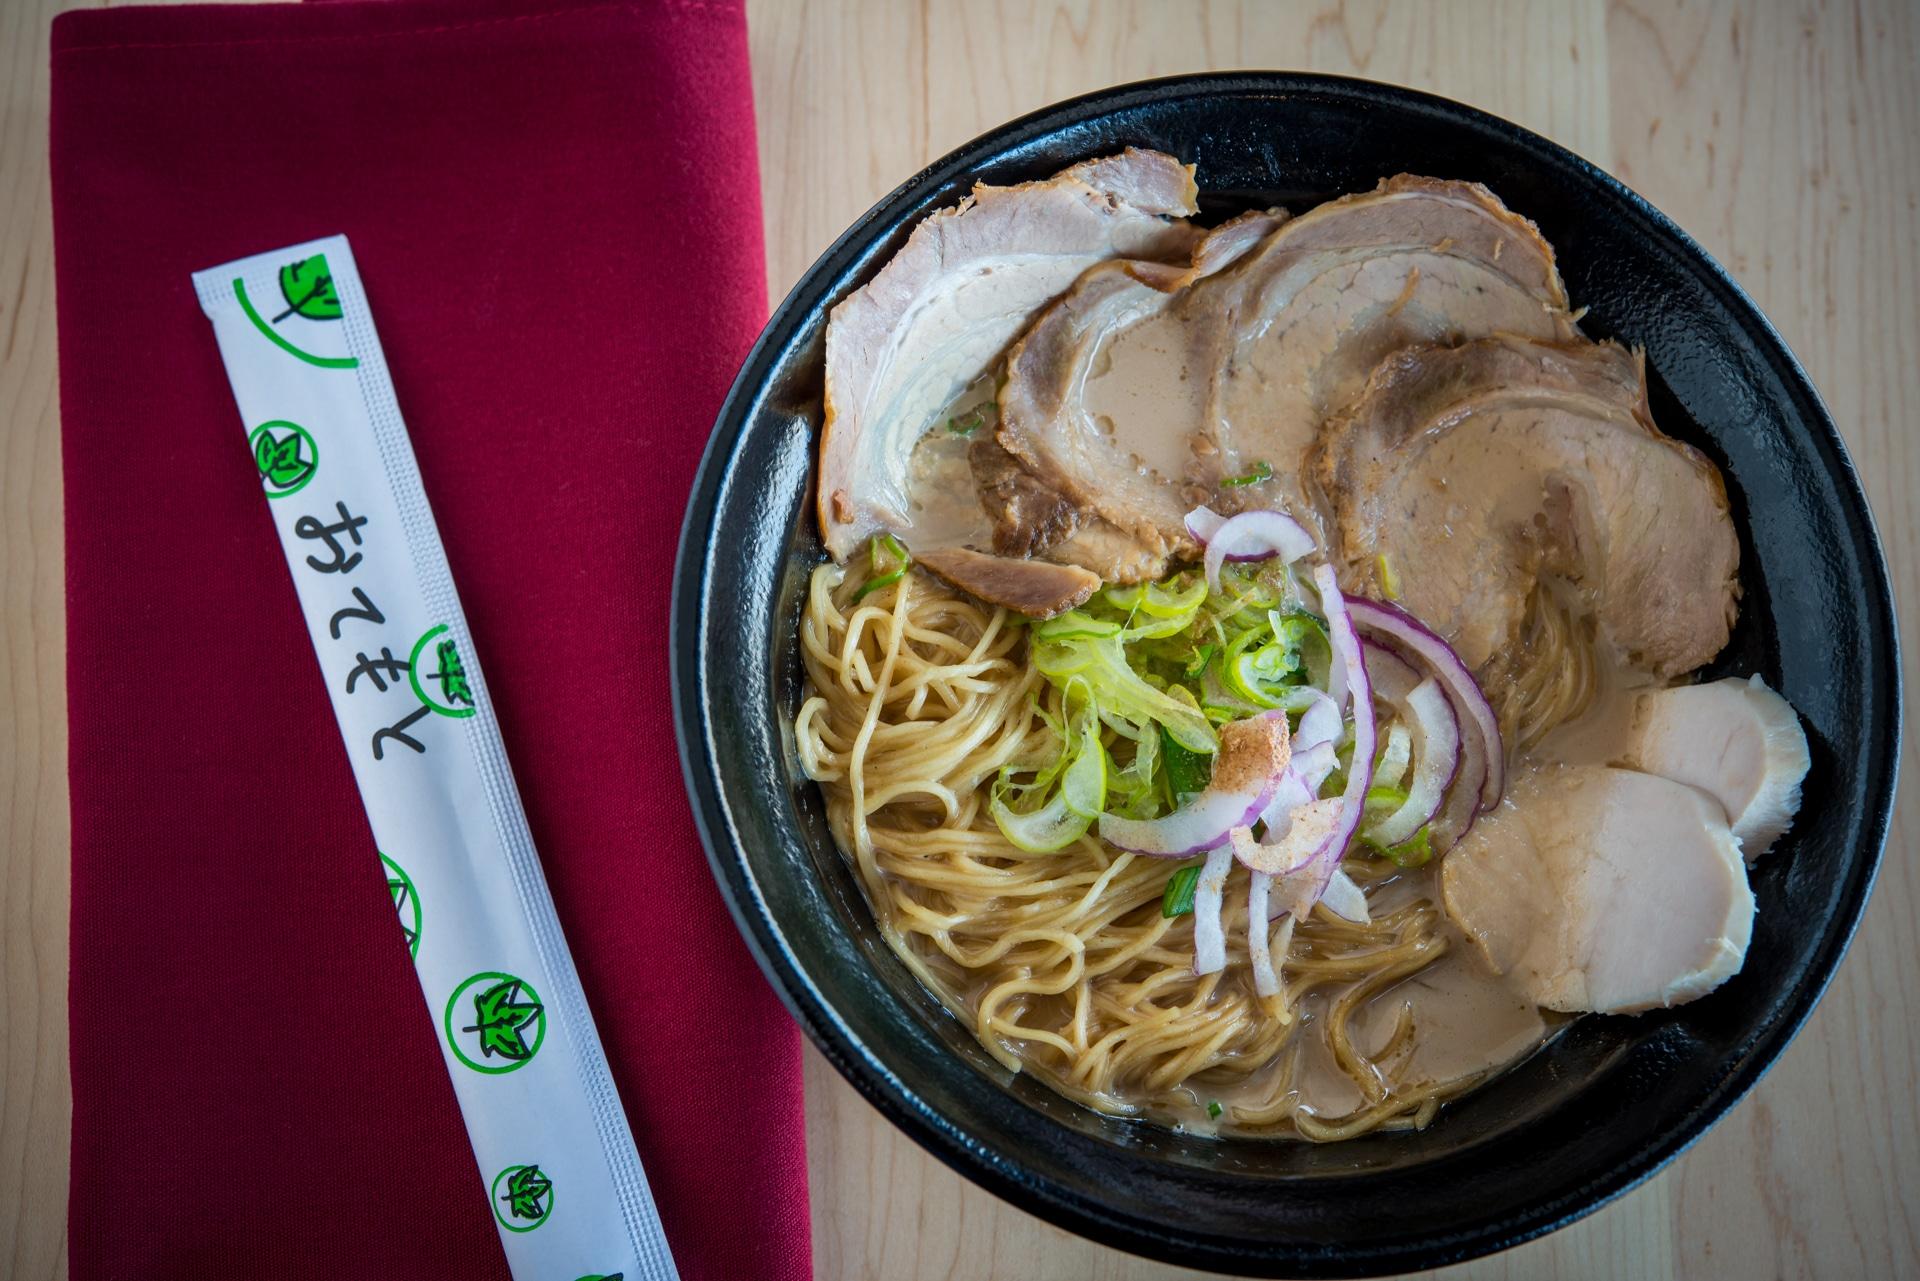 Hojo's Japanese Cuisine ramen